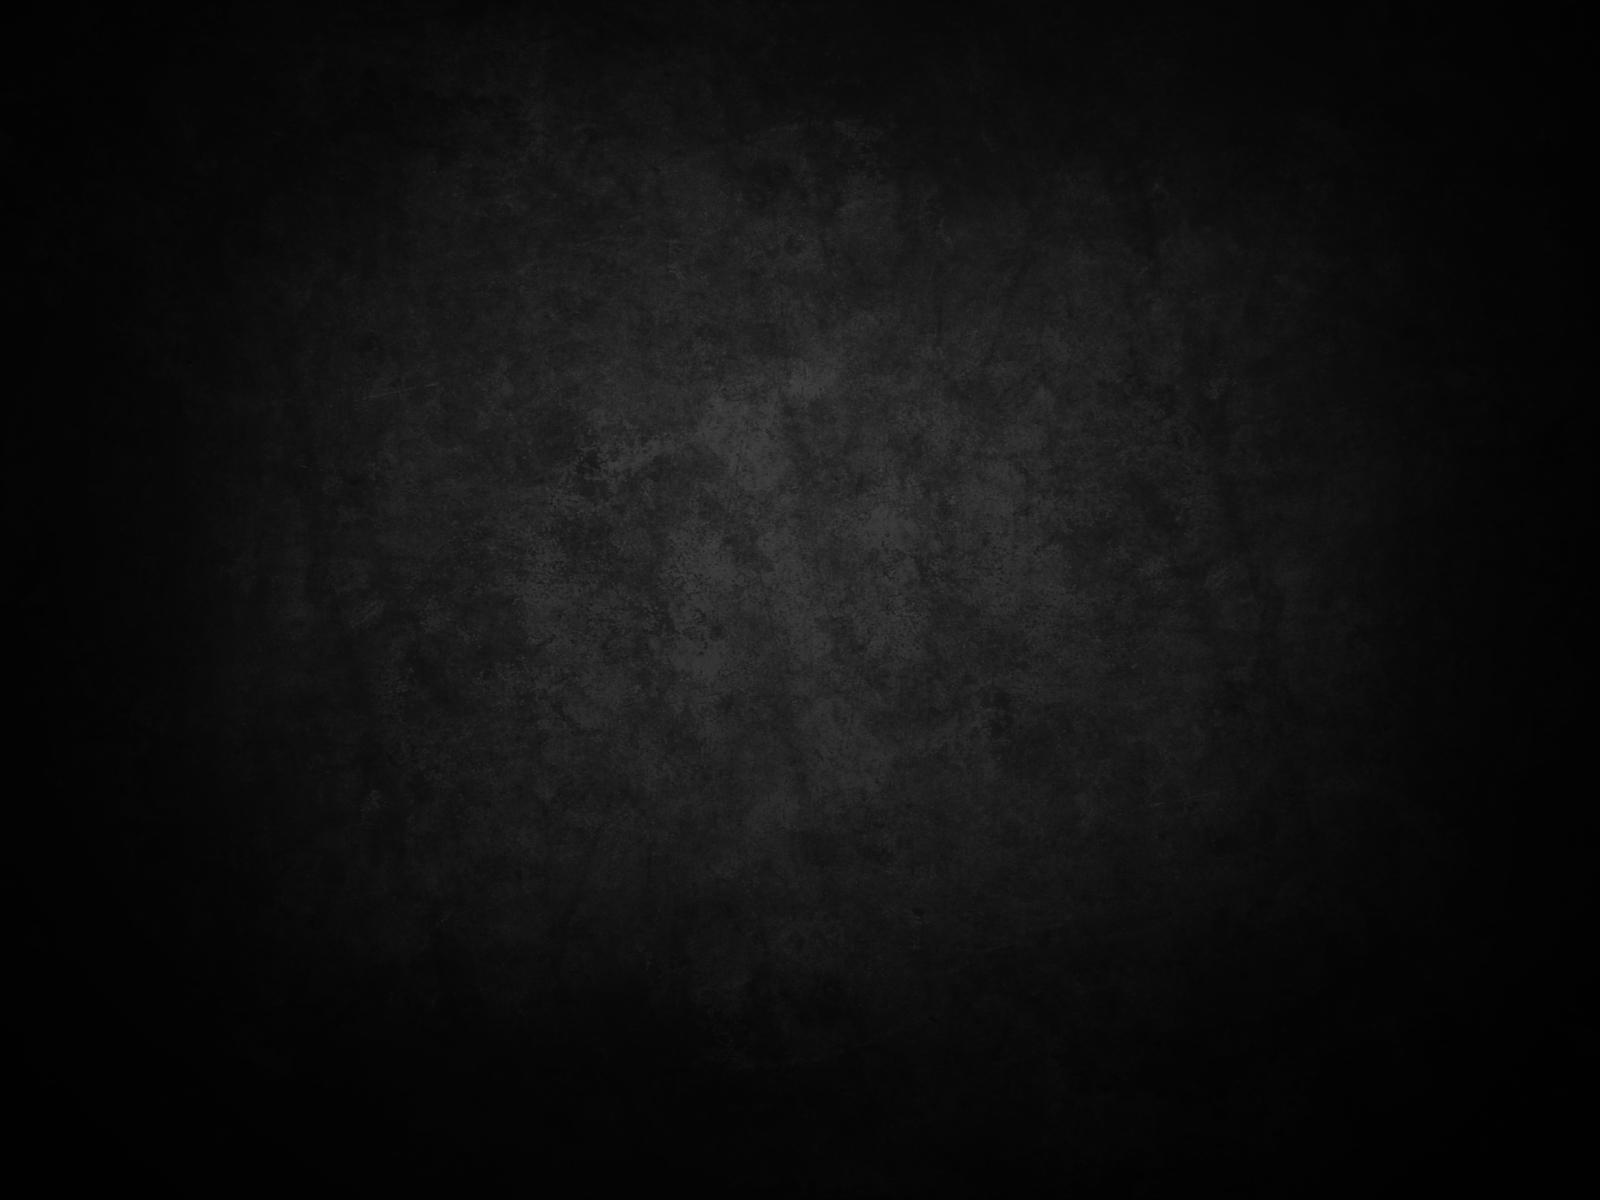 Free Wallpaper Black Background